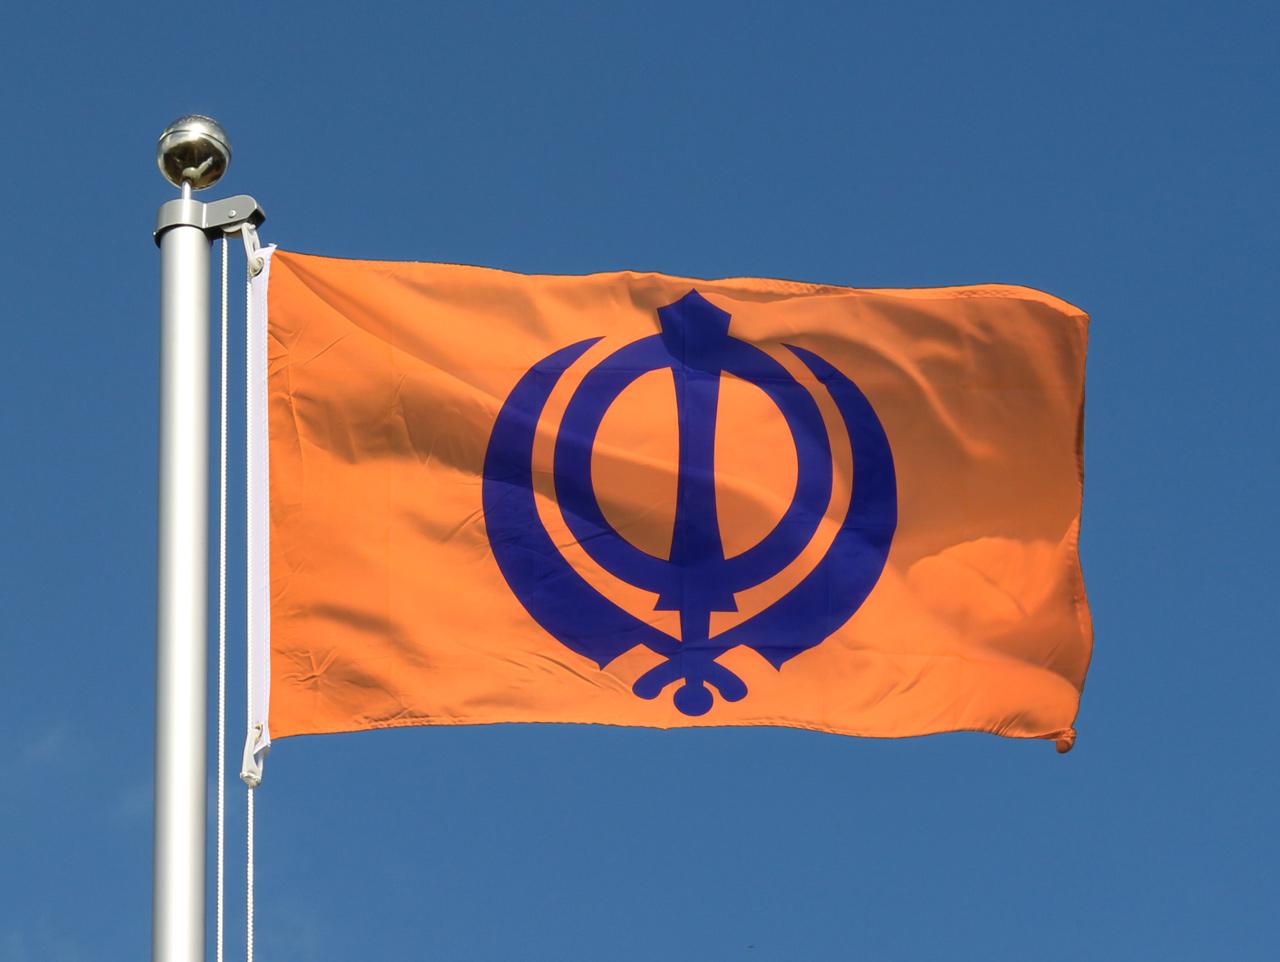 Cheap Sikhism Flag - 2x3 ft - Royal-Flags